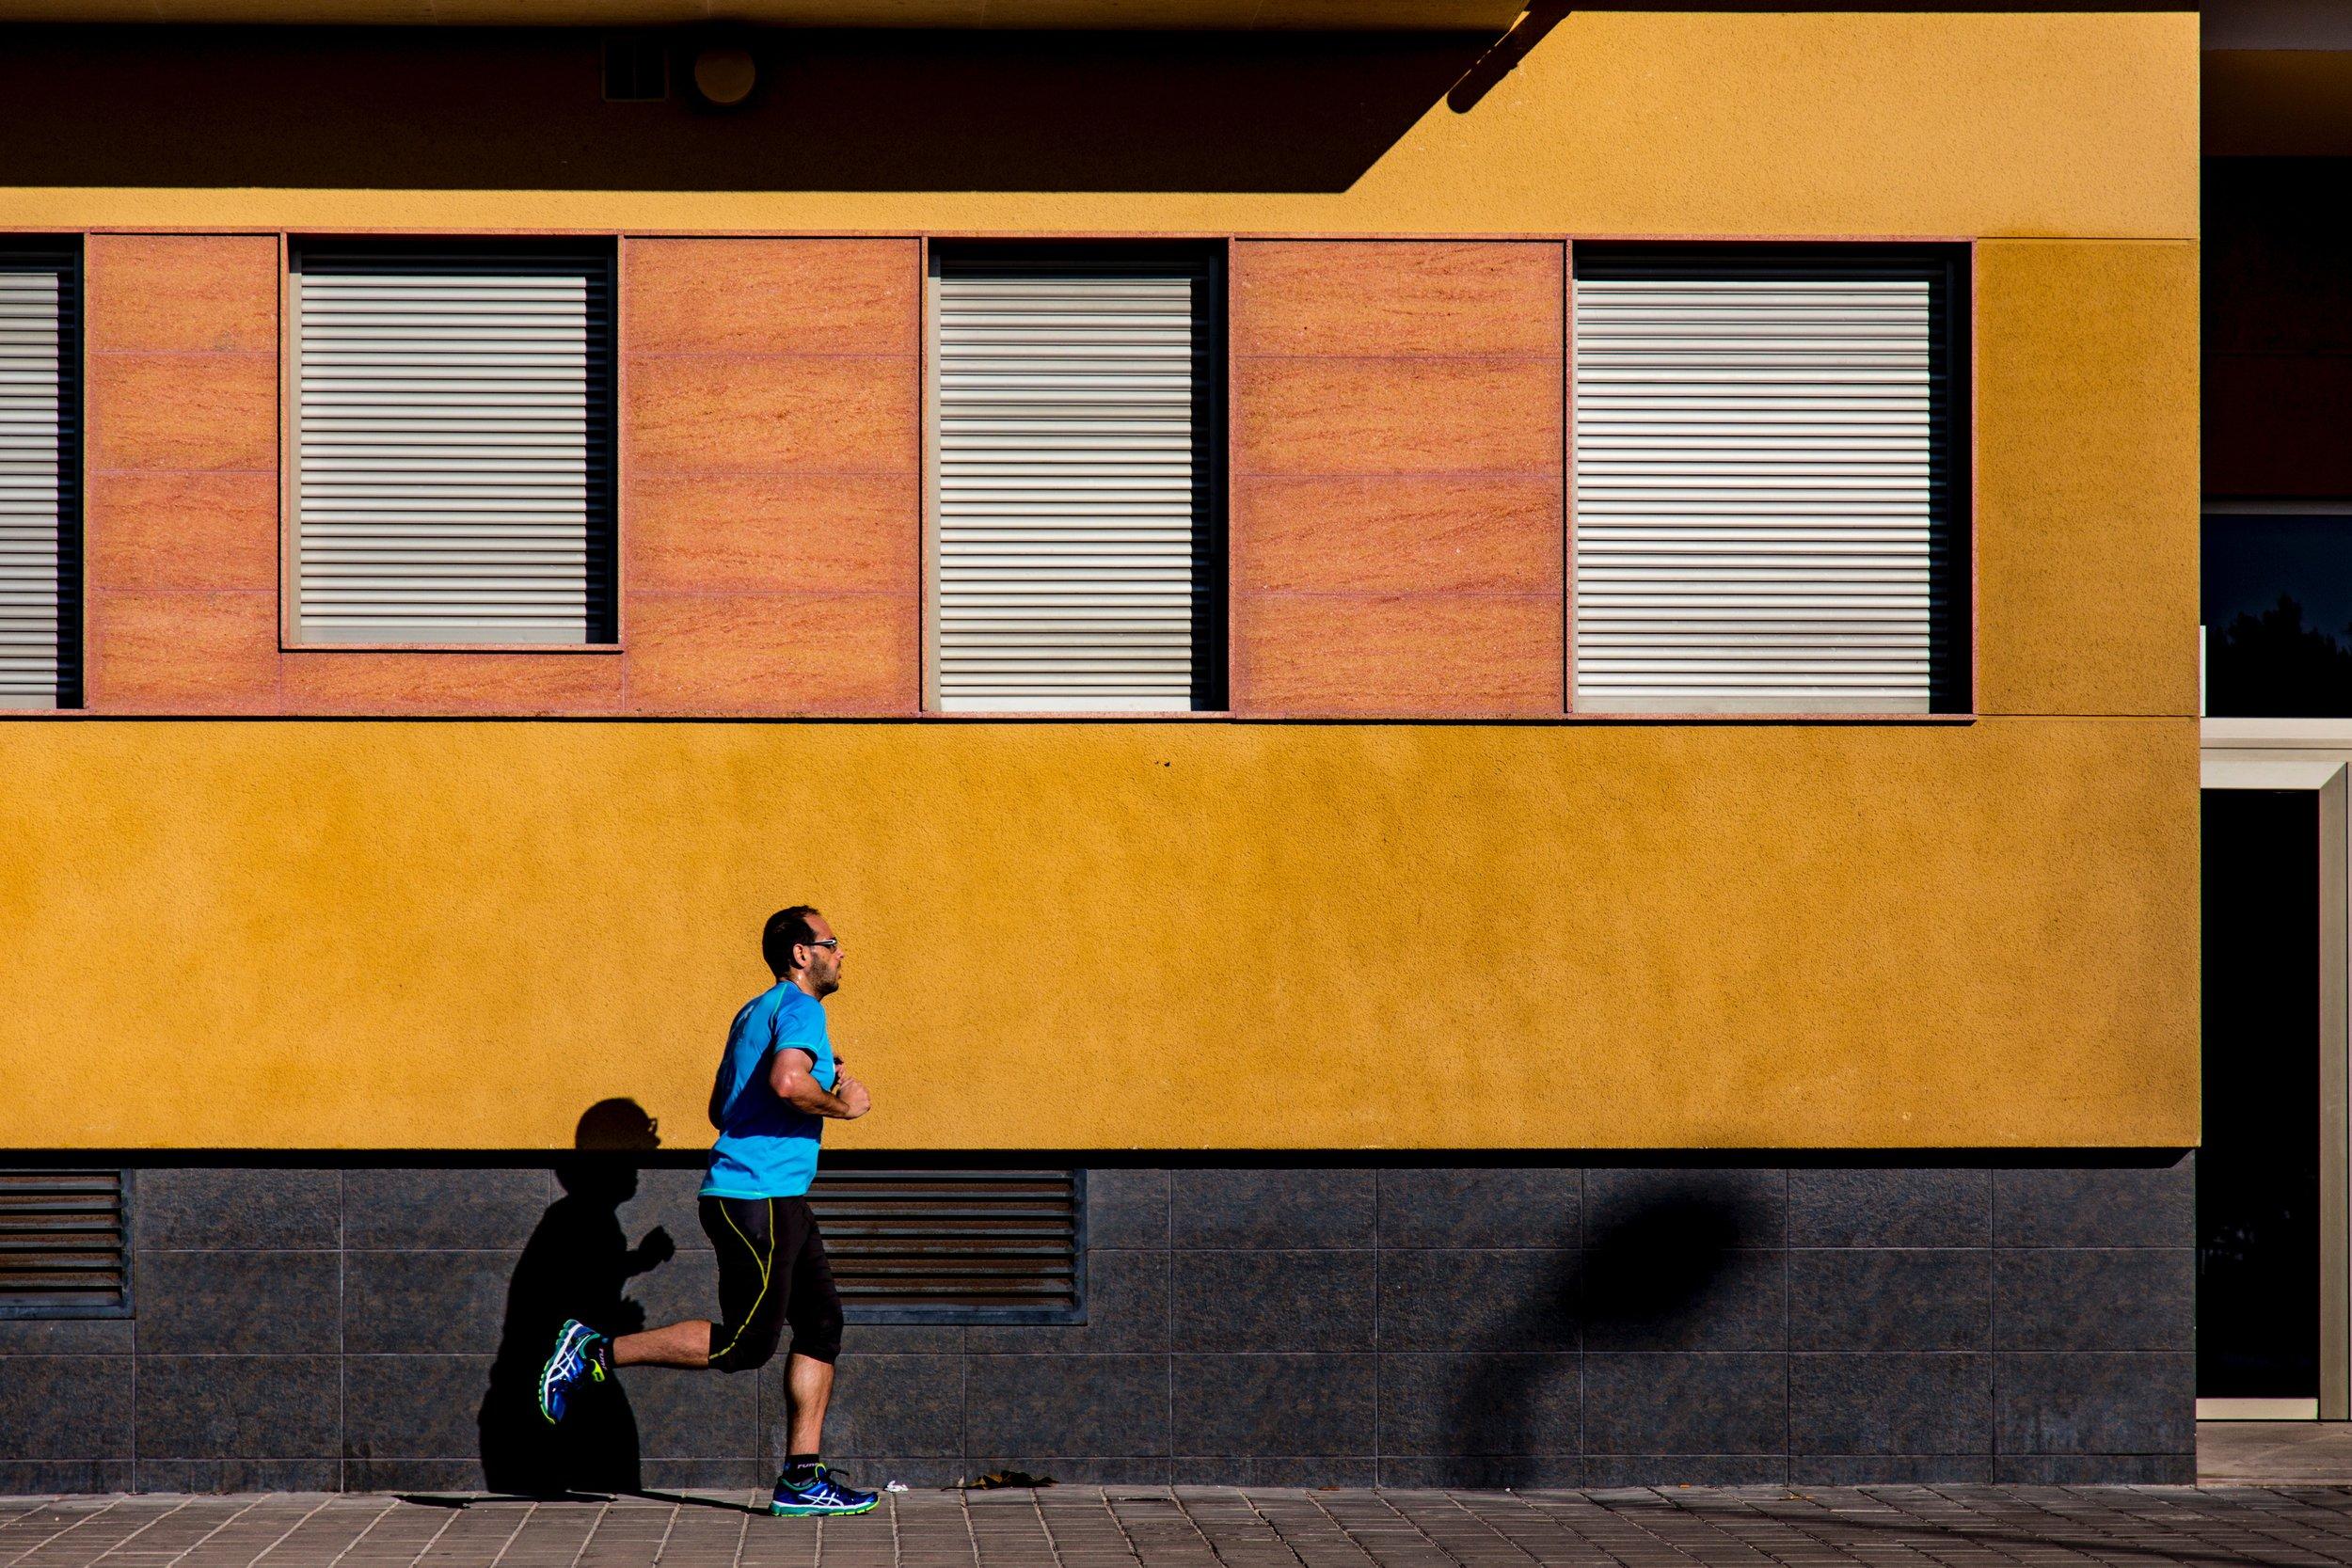 Man running. Image from pixels.com